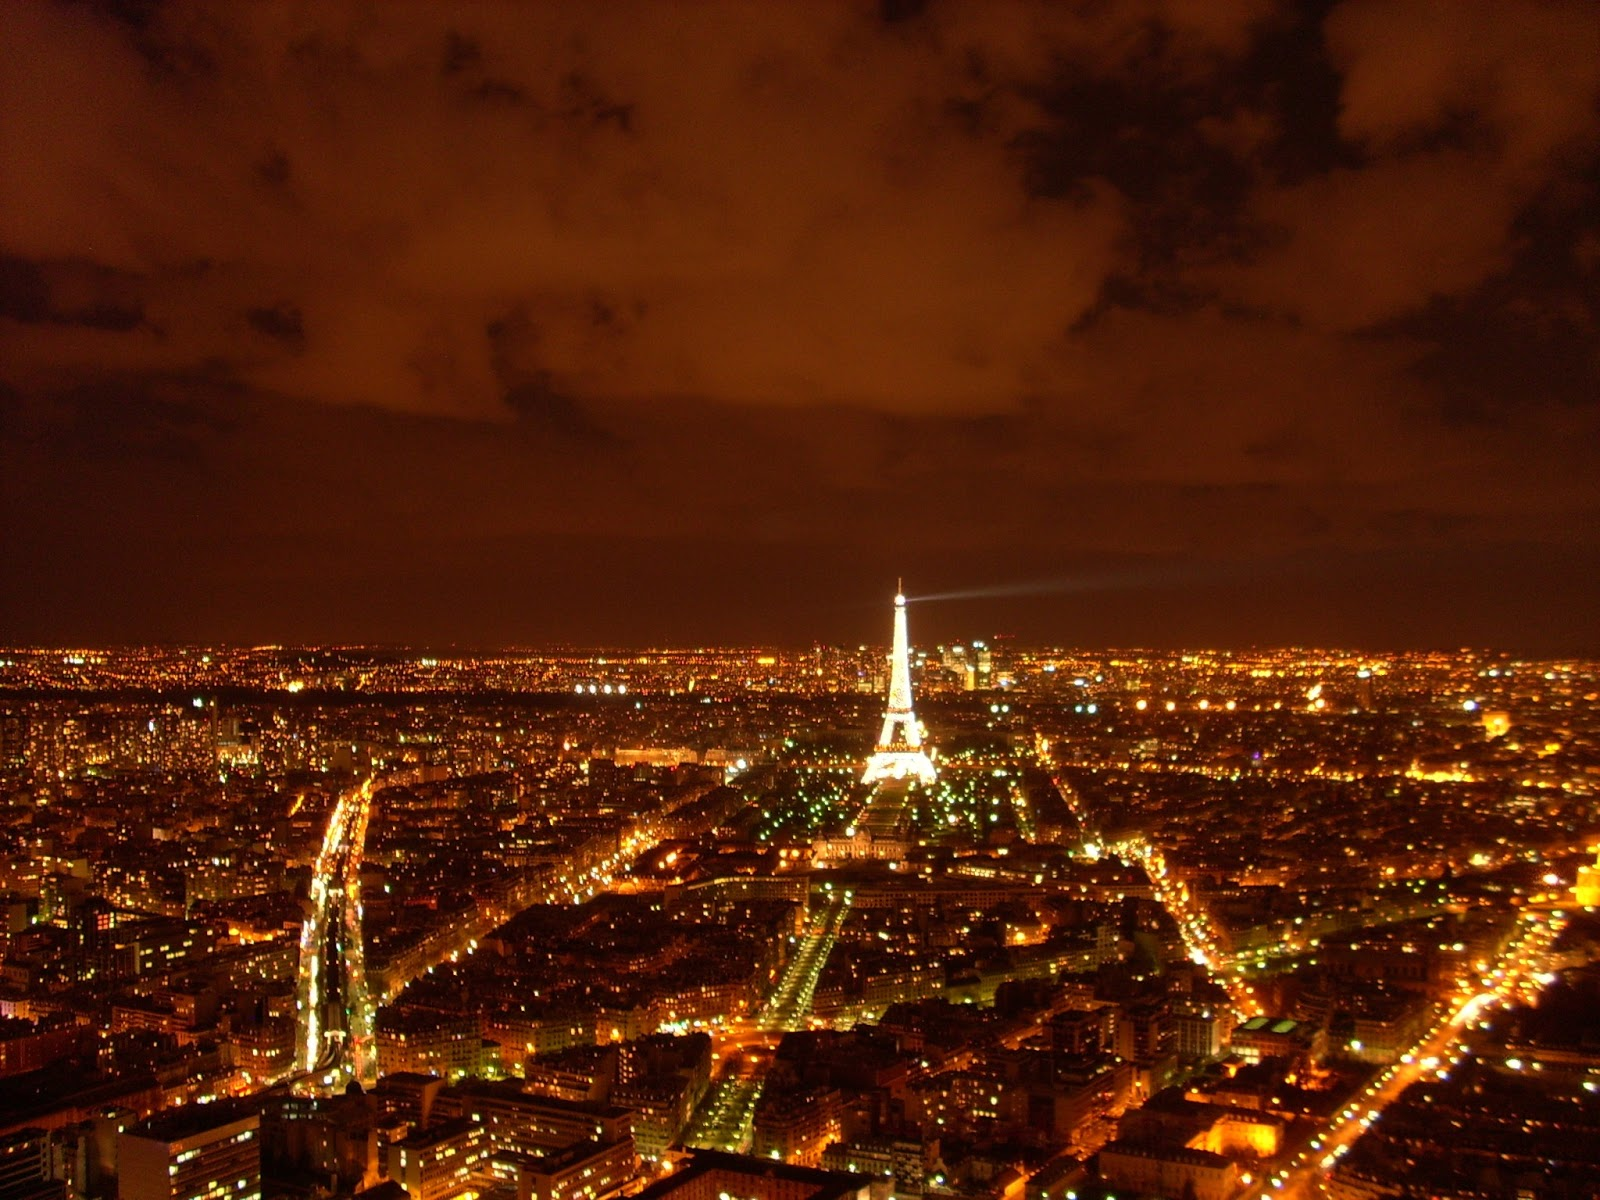 city at night wallpaper apk   wwwhigh definition wallpapercom 1600x1200